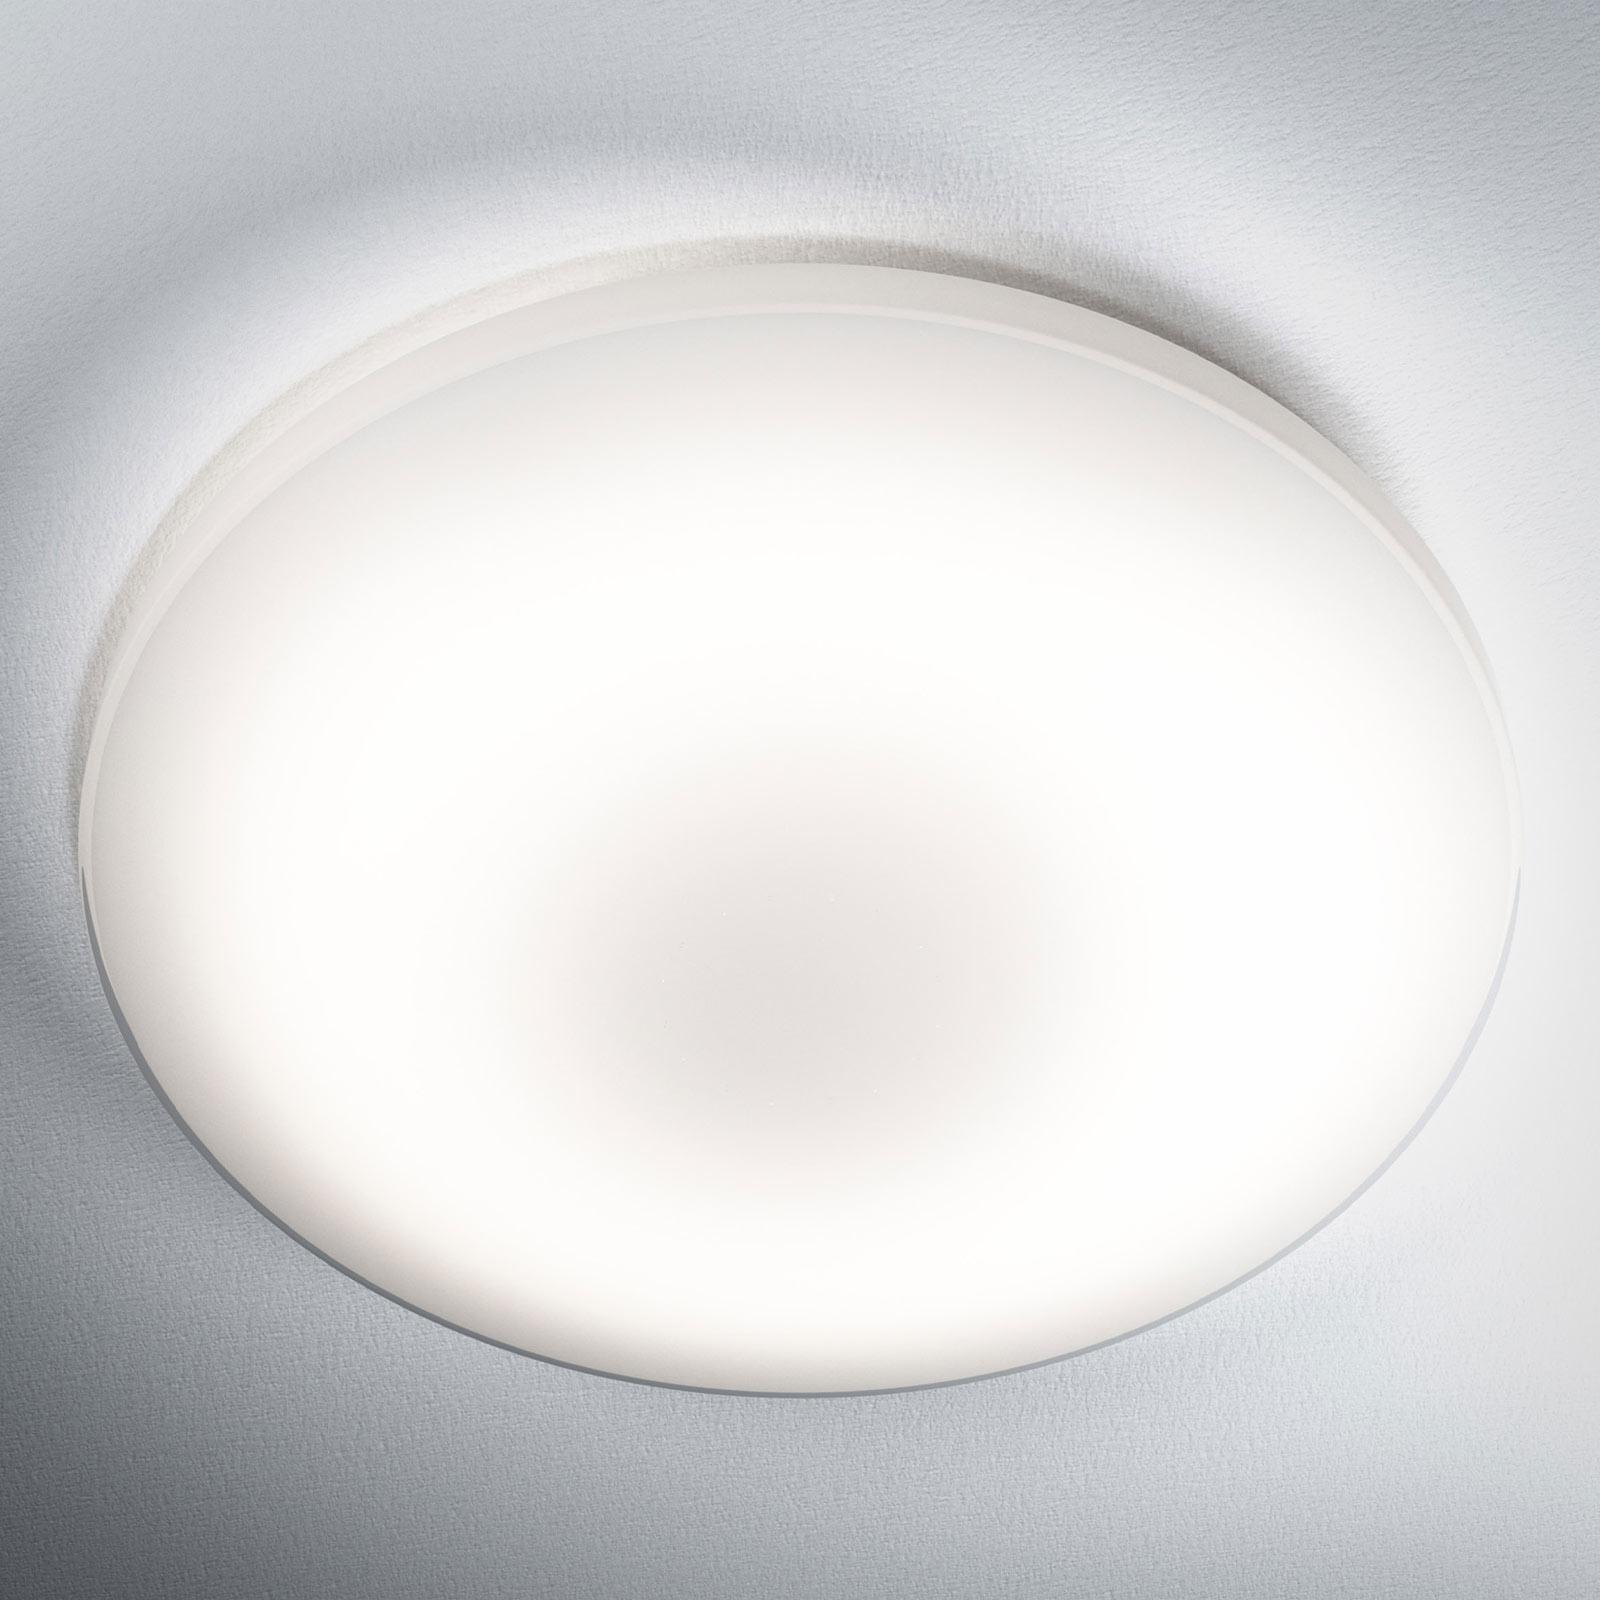 LEDVANCE Orbis Pure LED-Deckenlampe 40cm 21W